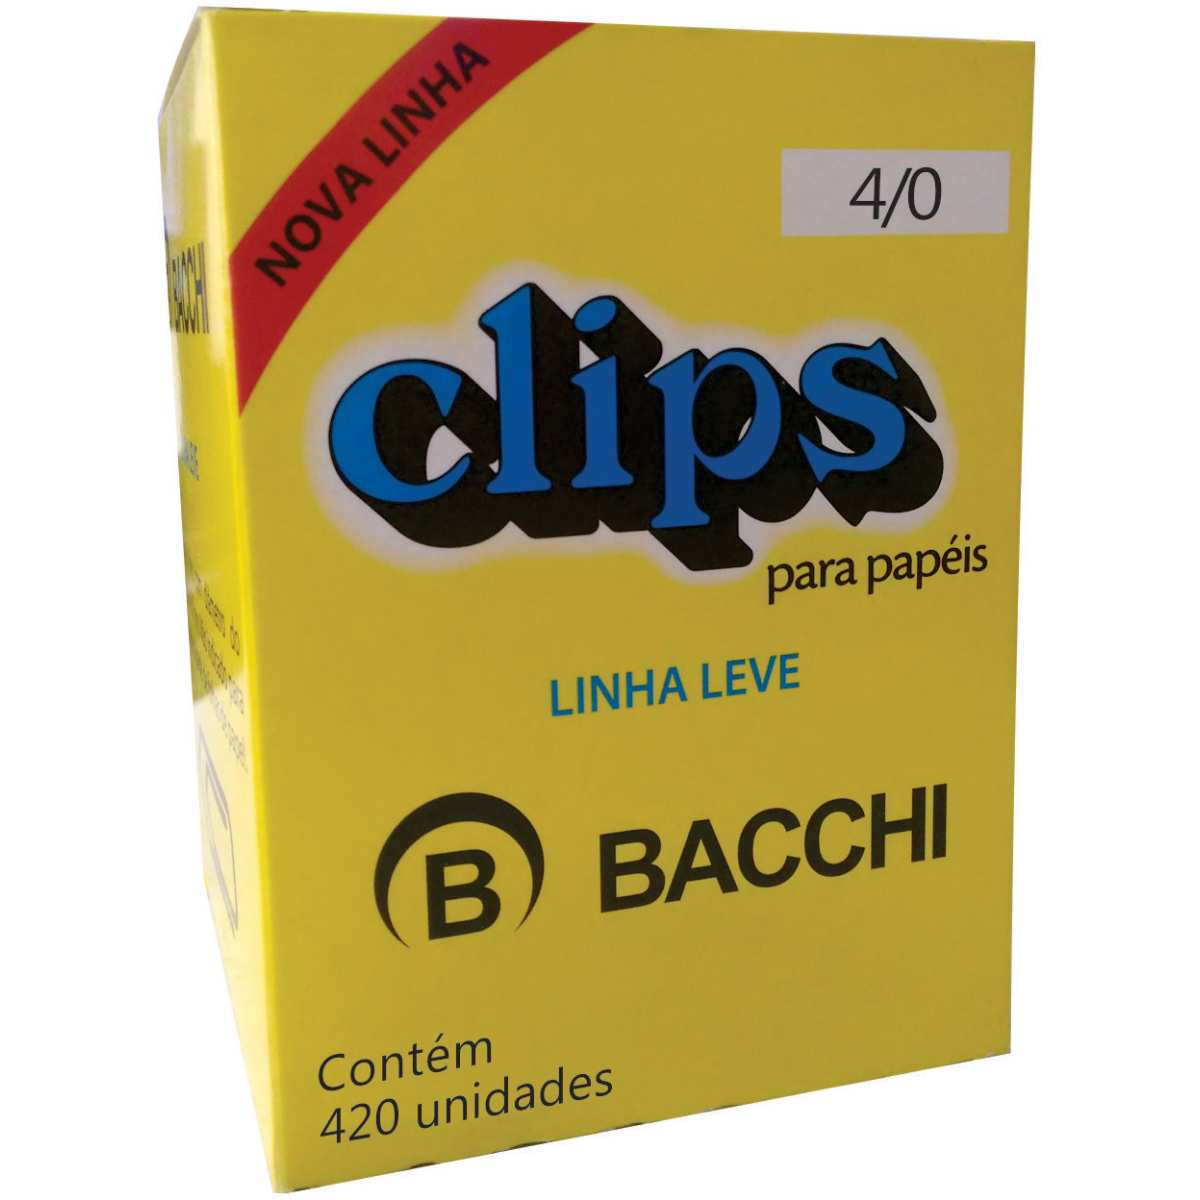 CLIPS METÁLICOS BACCHI Nº 4/0 420UN